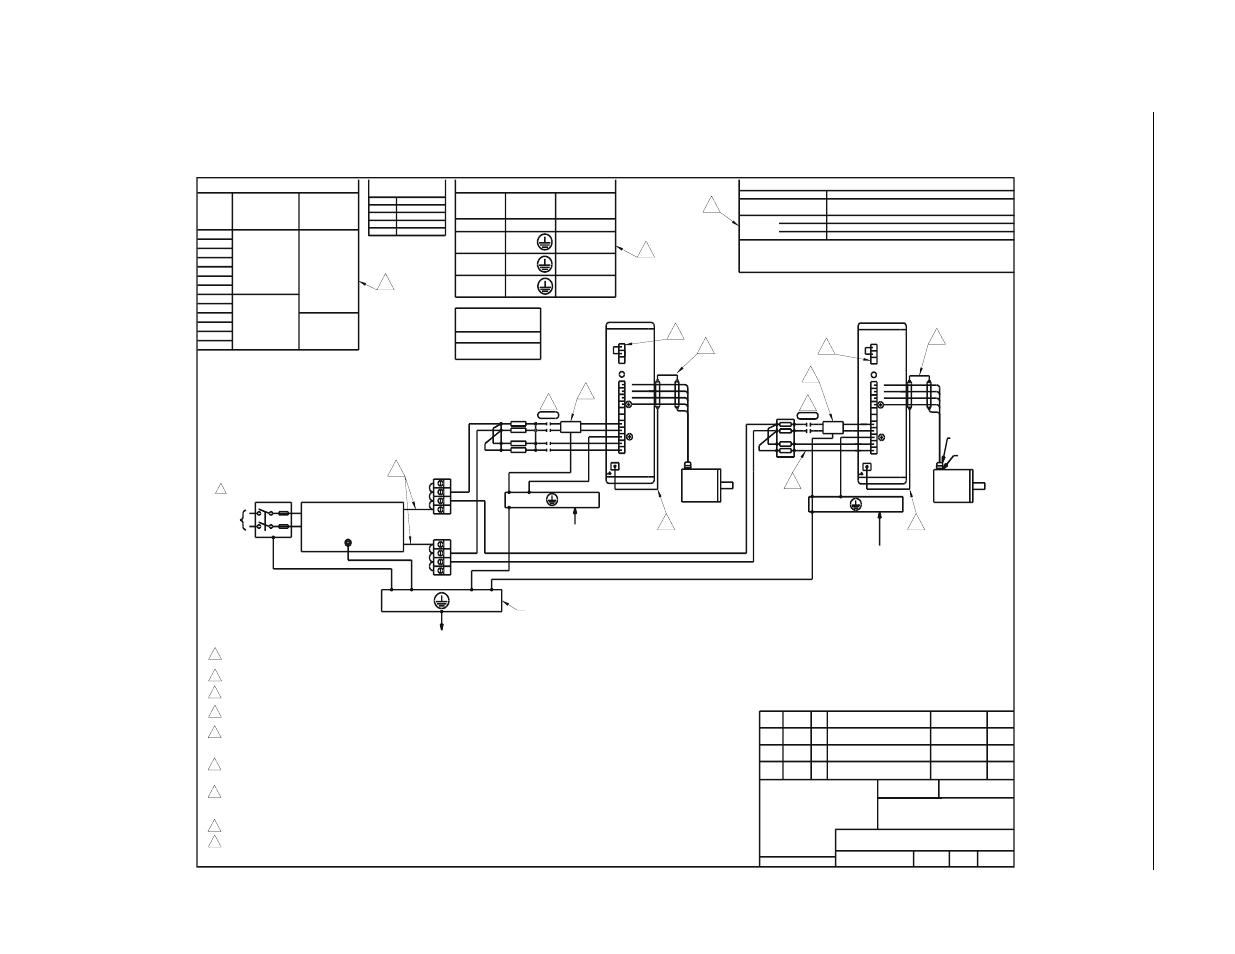 Power Wiring Diagram Figure 54 Diagrams Rockwell Sheet 1 Of